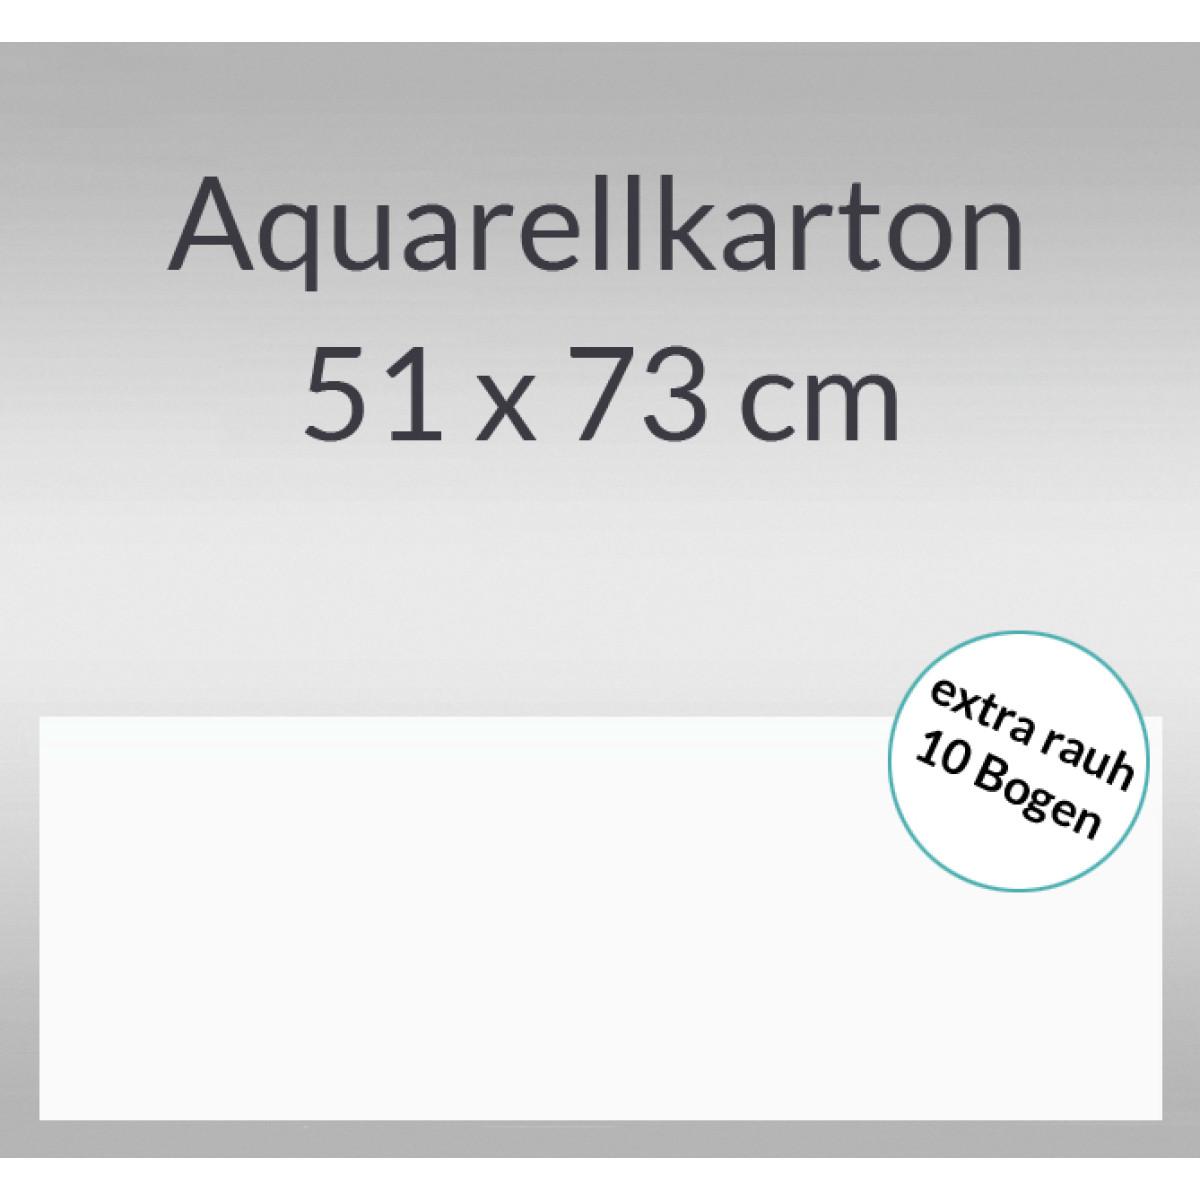 Aquarellkarton extra rauh 250 g/qm 51 x 73 cm